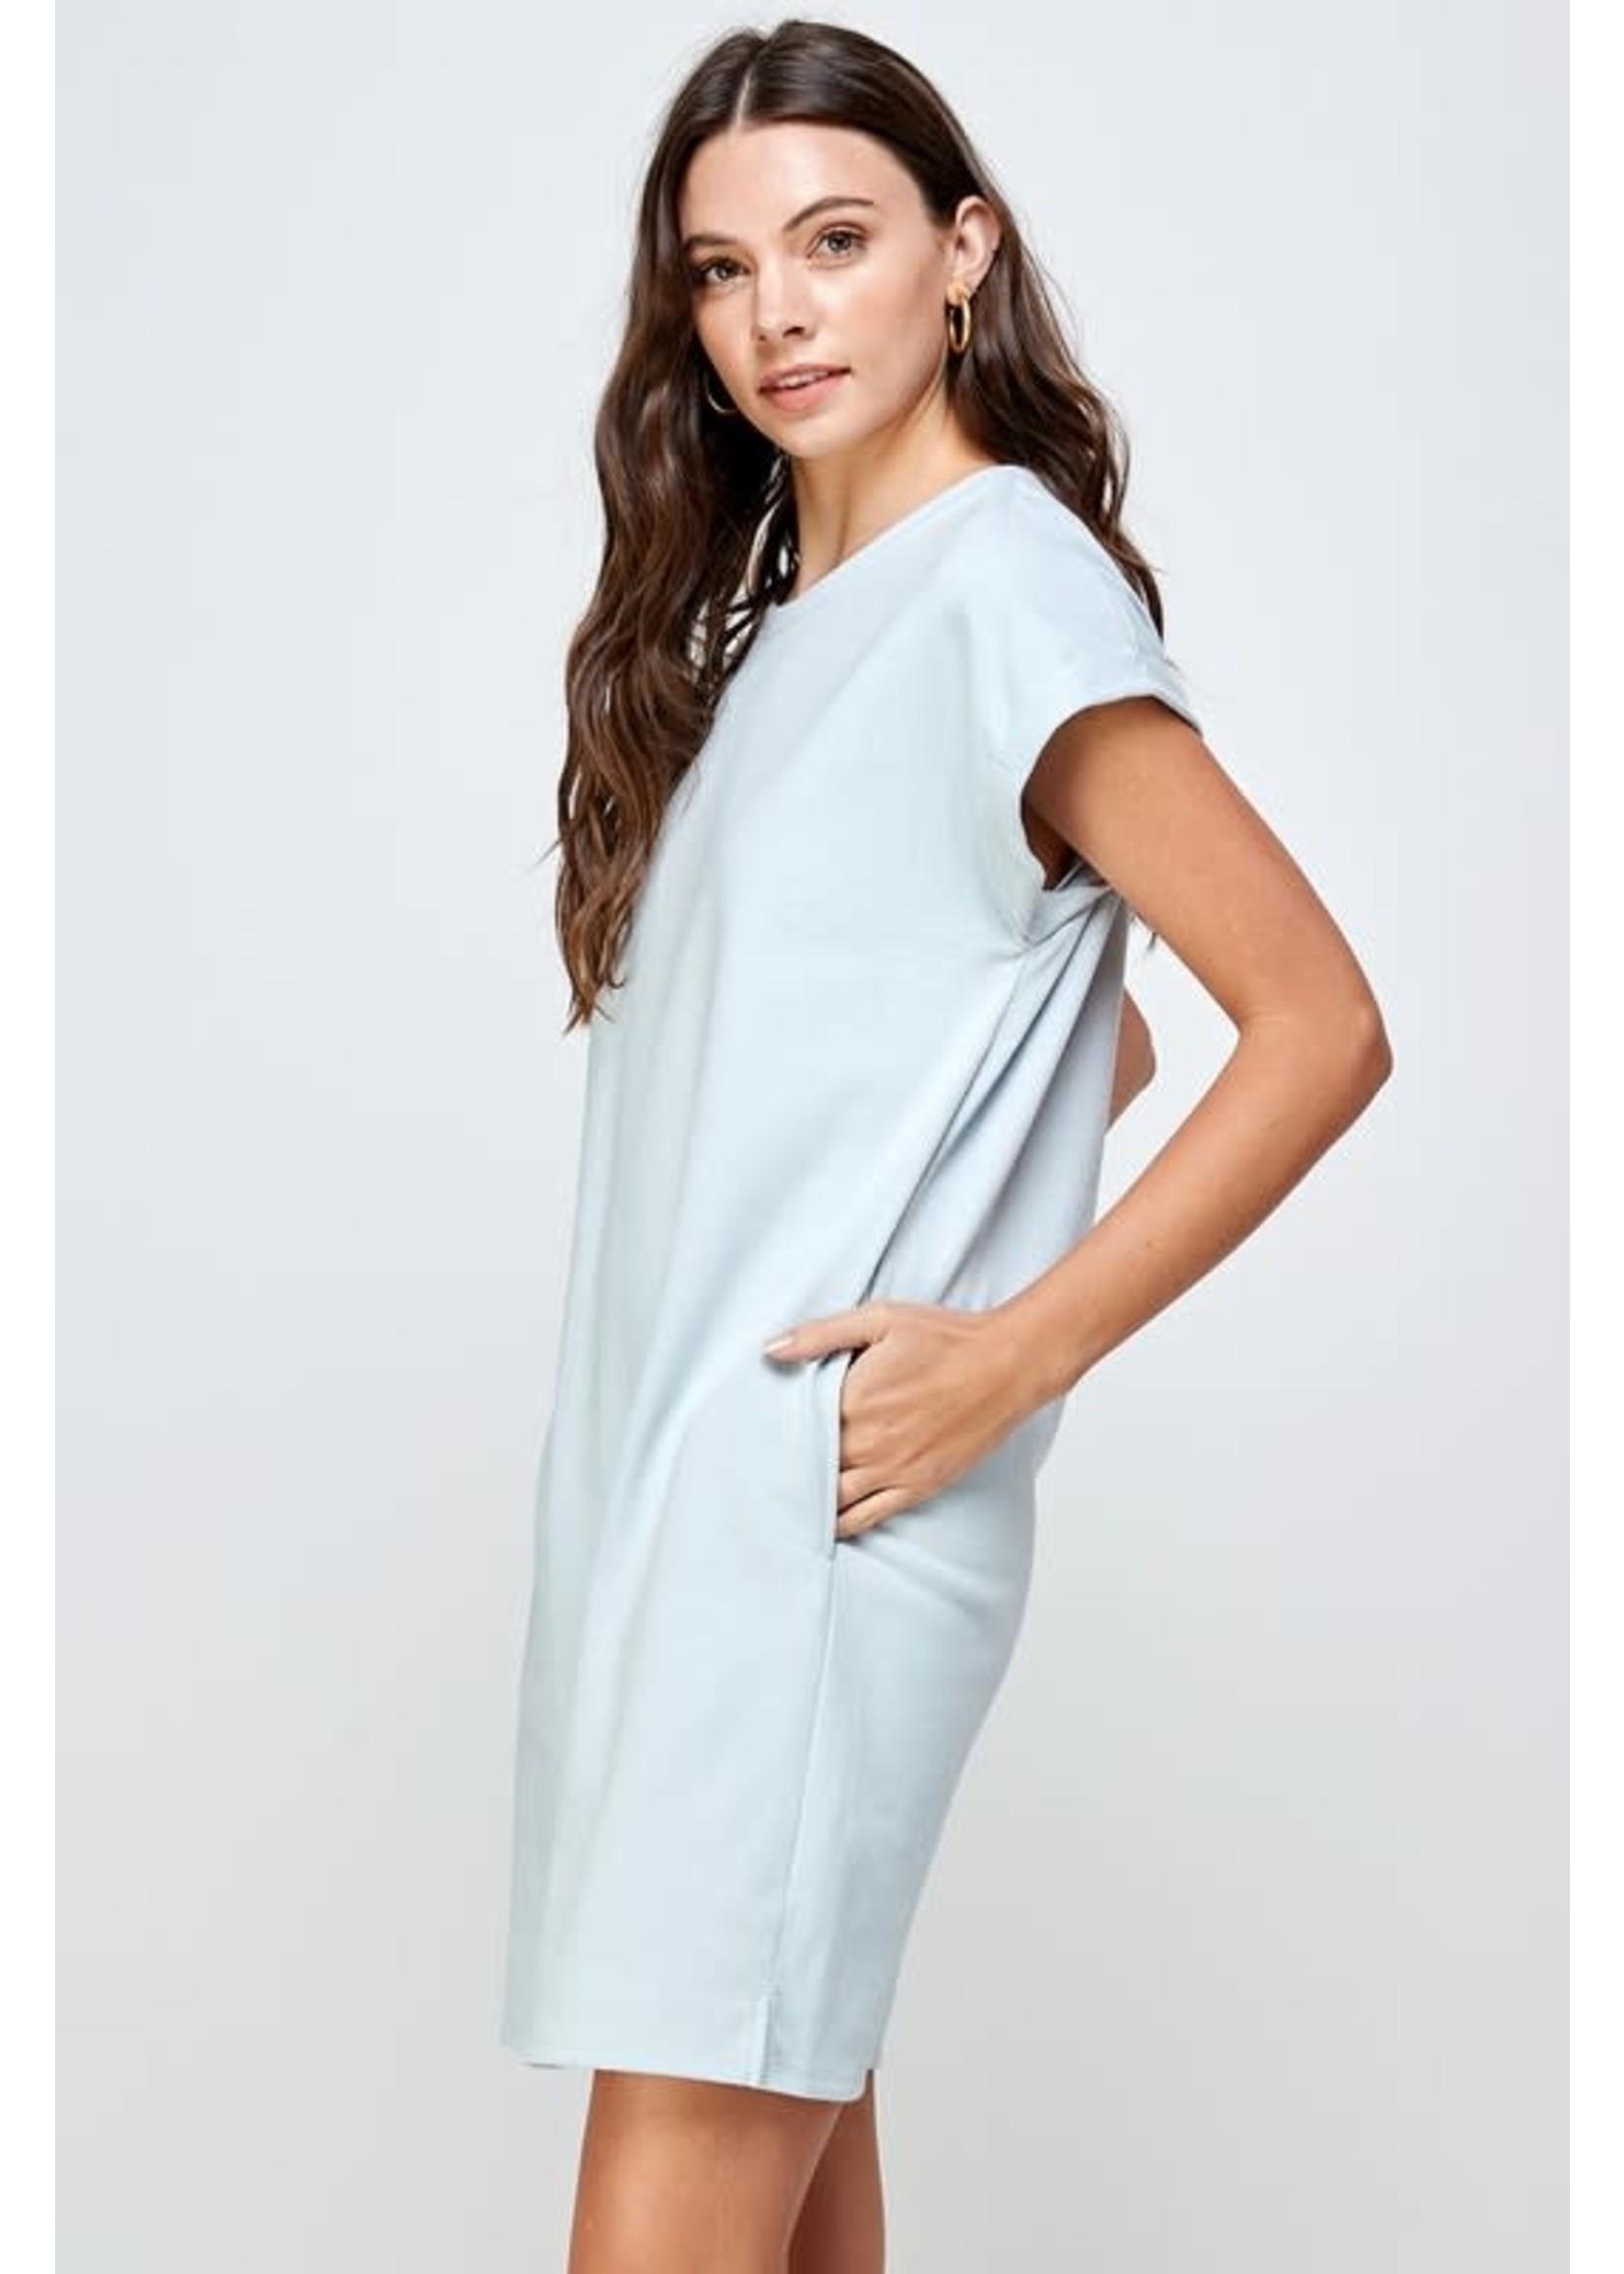 Ellison Solid T-Shirt Dress - RD-3179